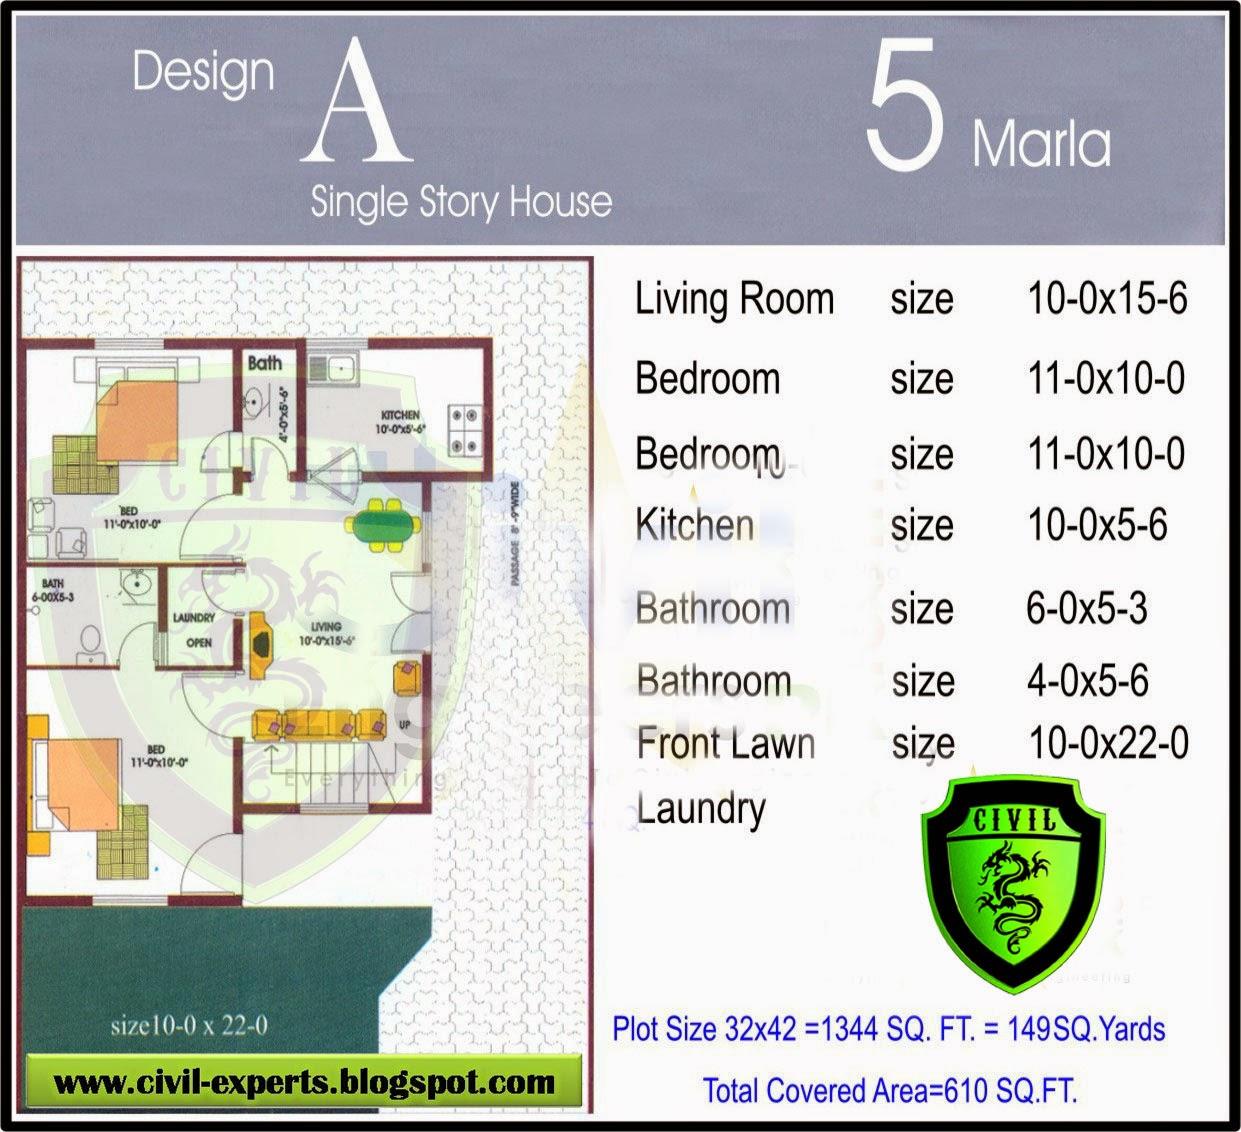 Civil Experts 5 Marla Houses Plans